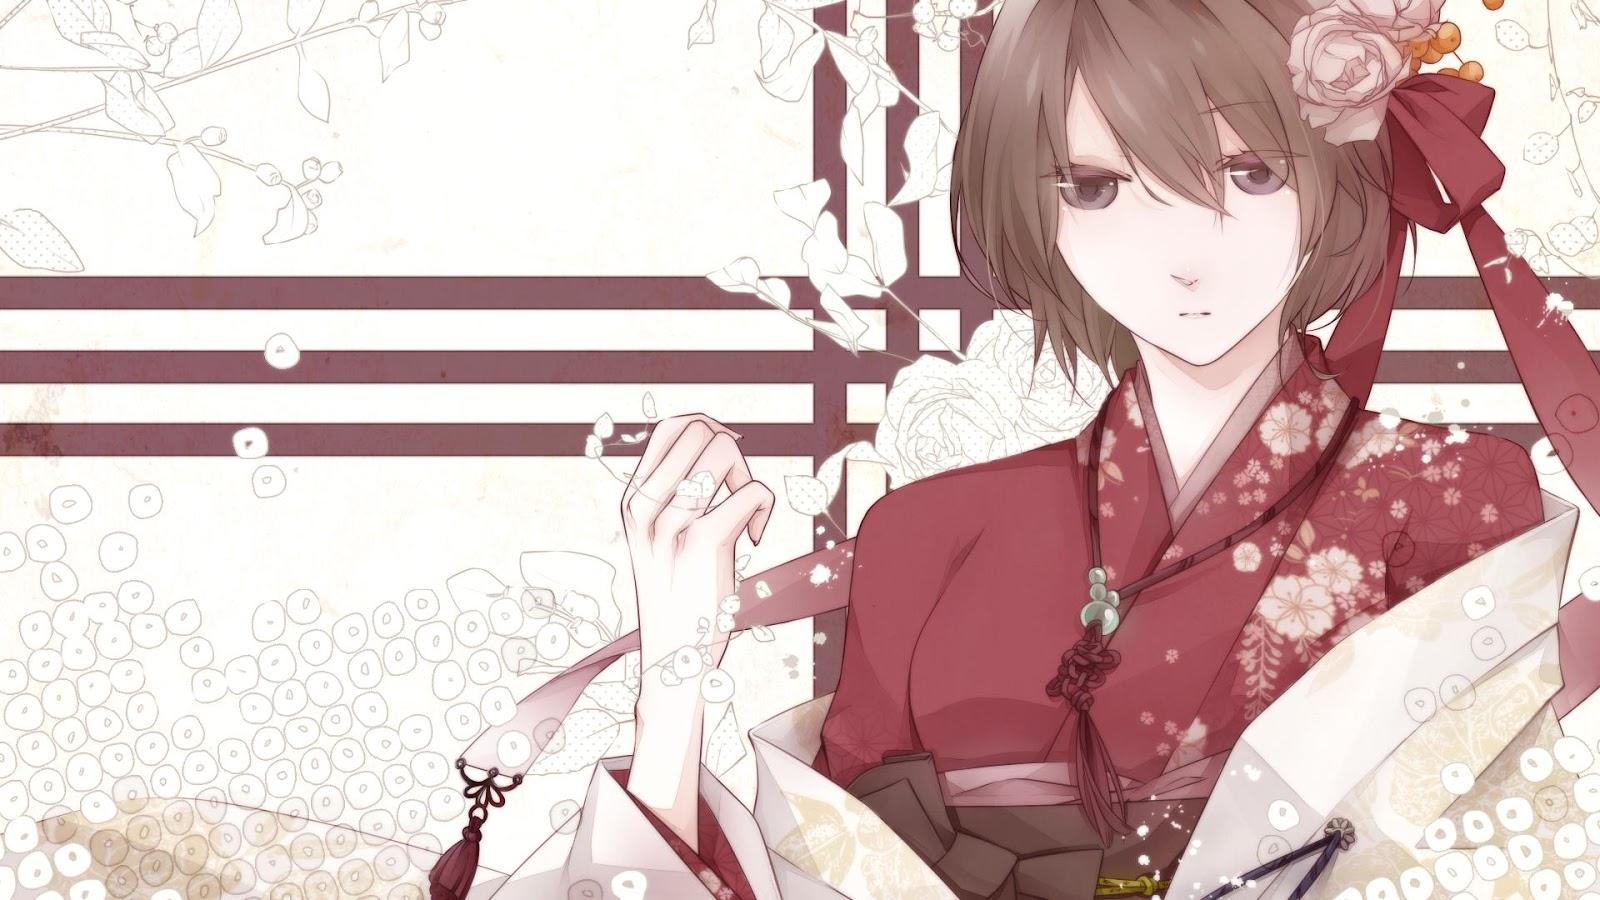 Innocent Anime Girl Wallpapers